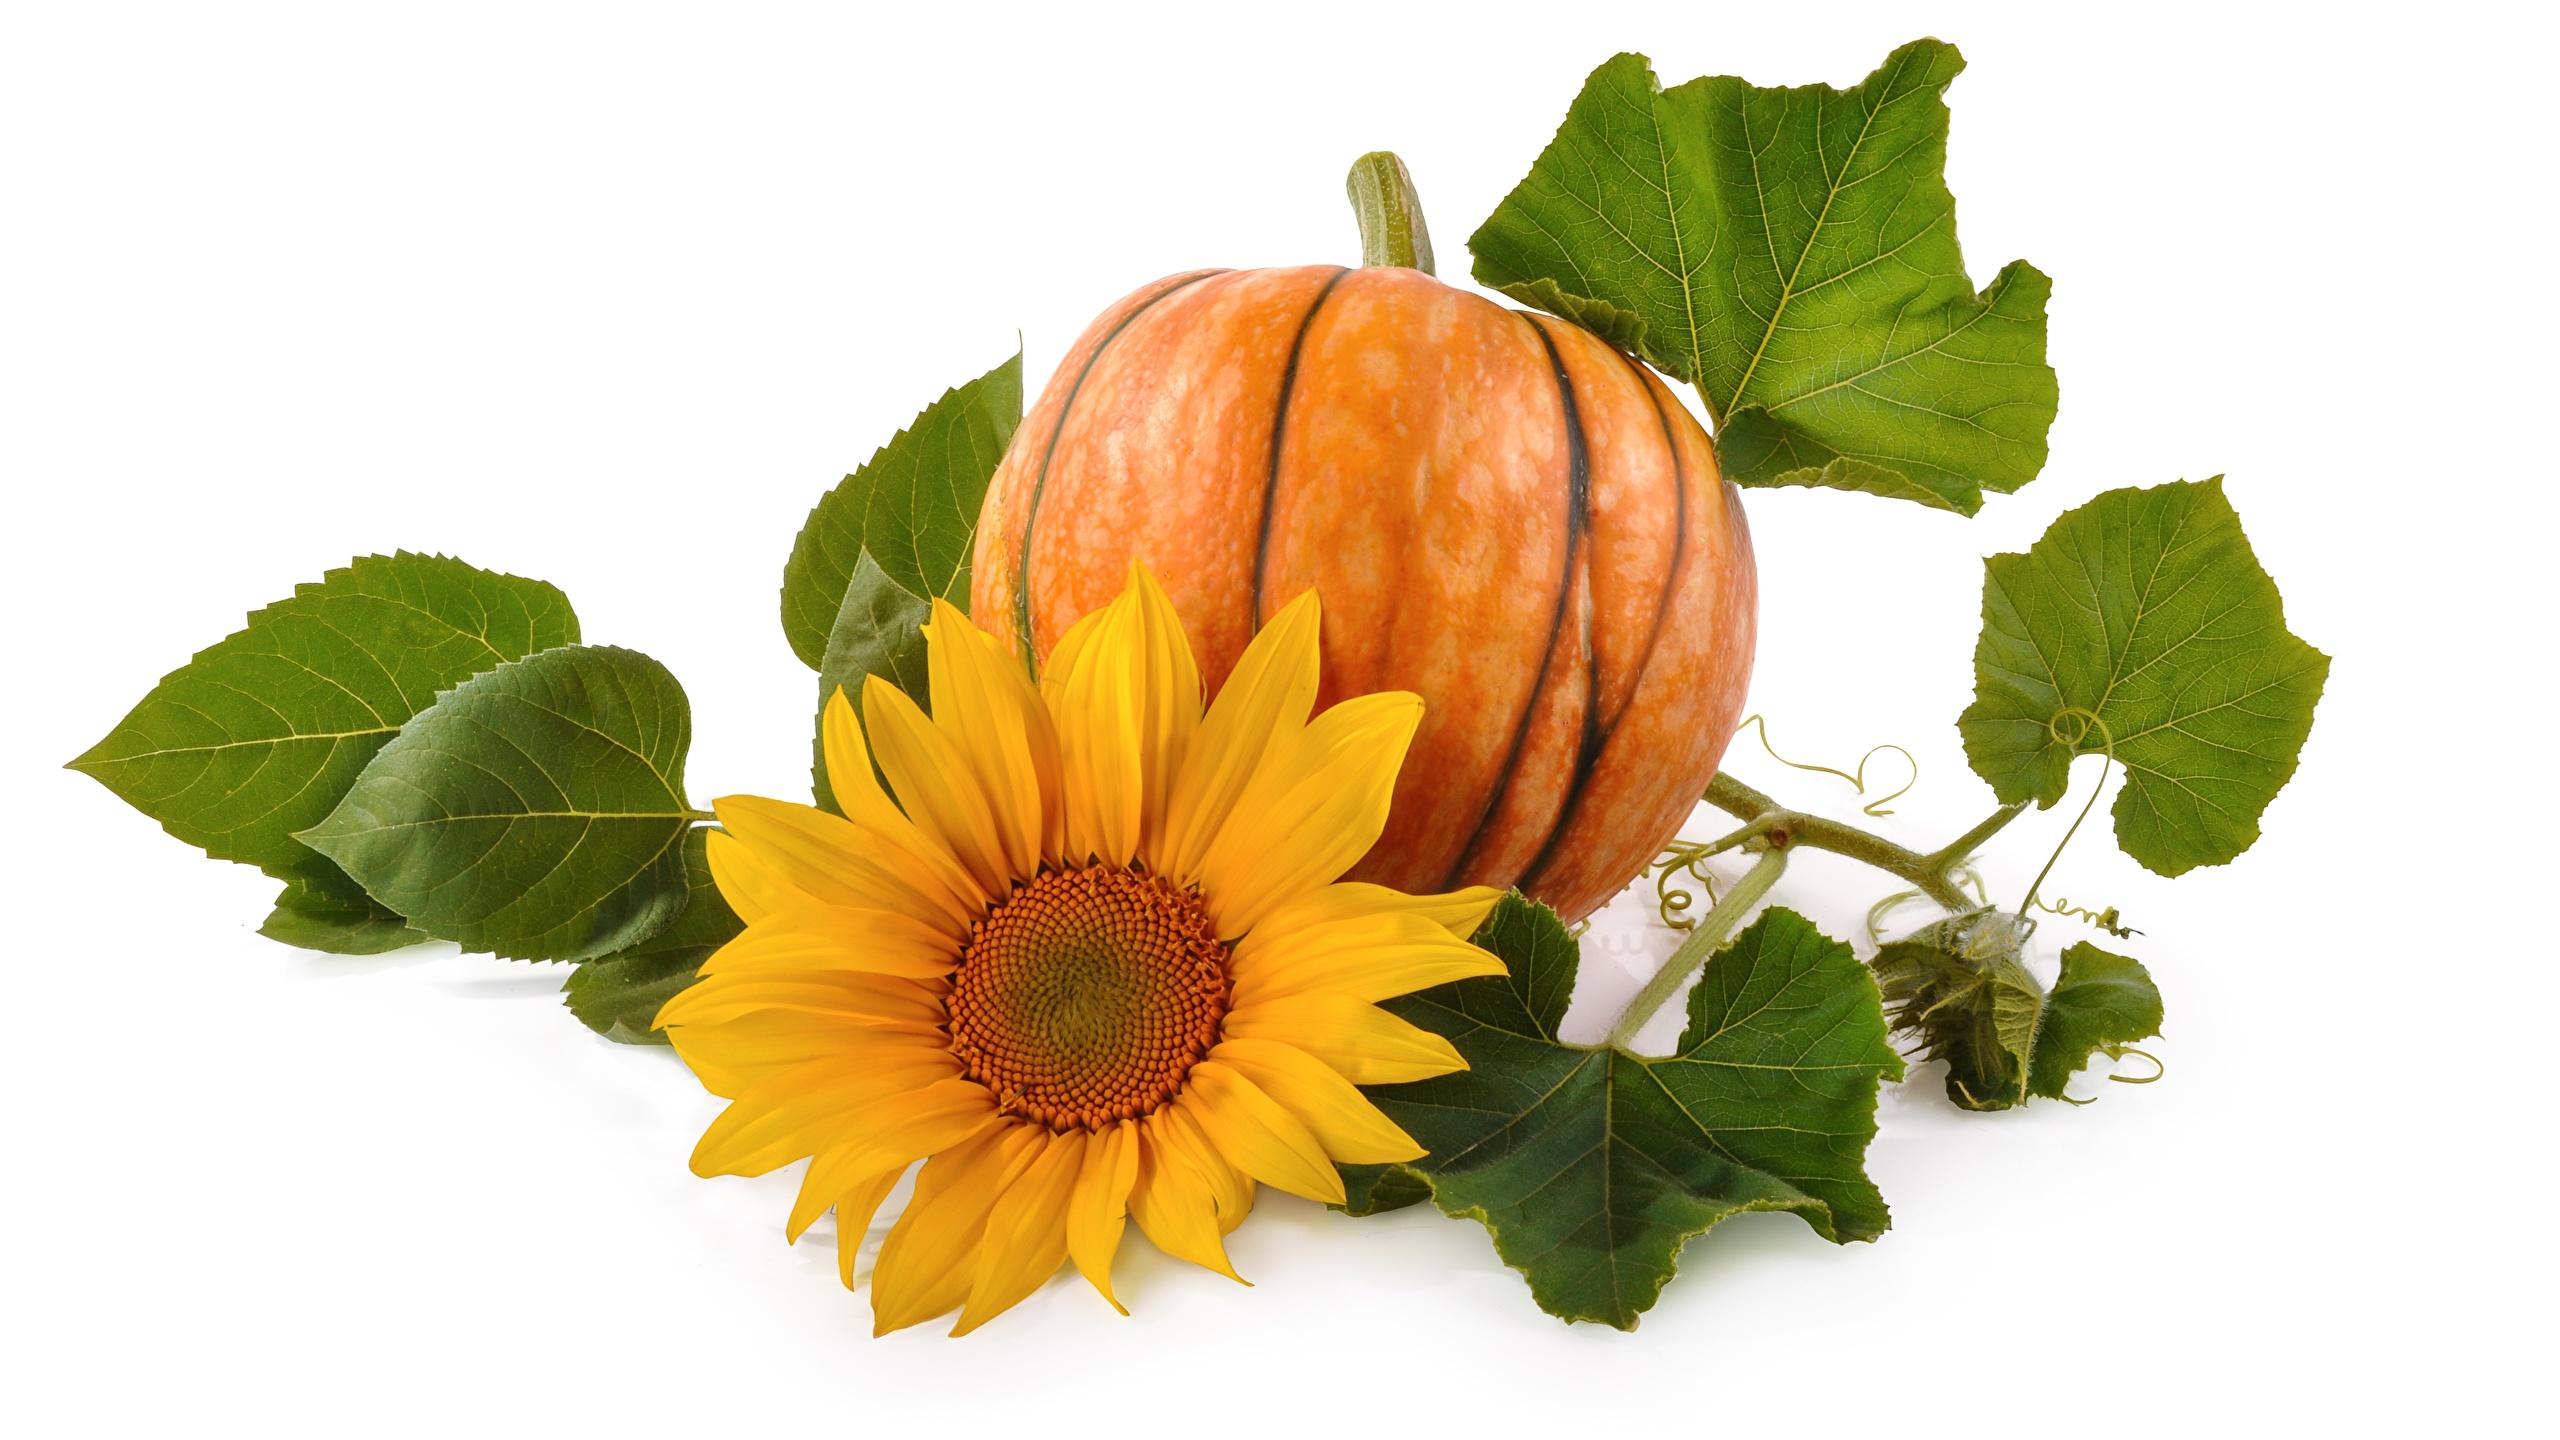 Desktop Wallpapers Foliage Pumpkin Sunflowers Food Closeup